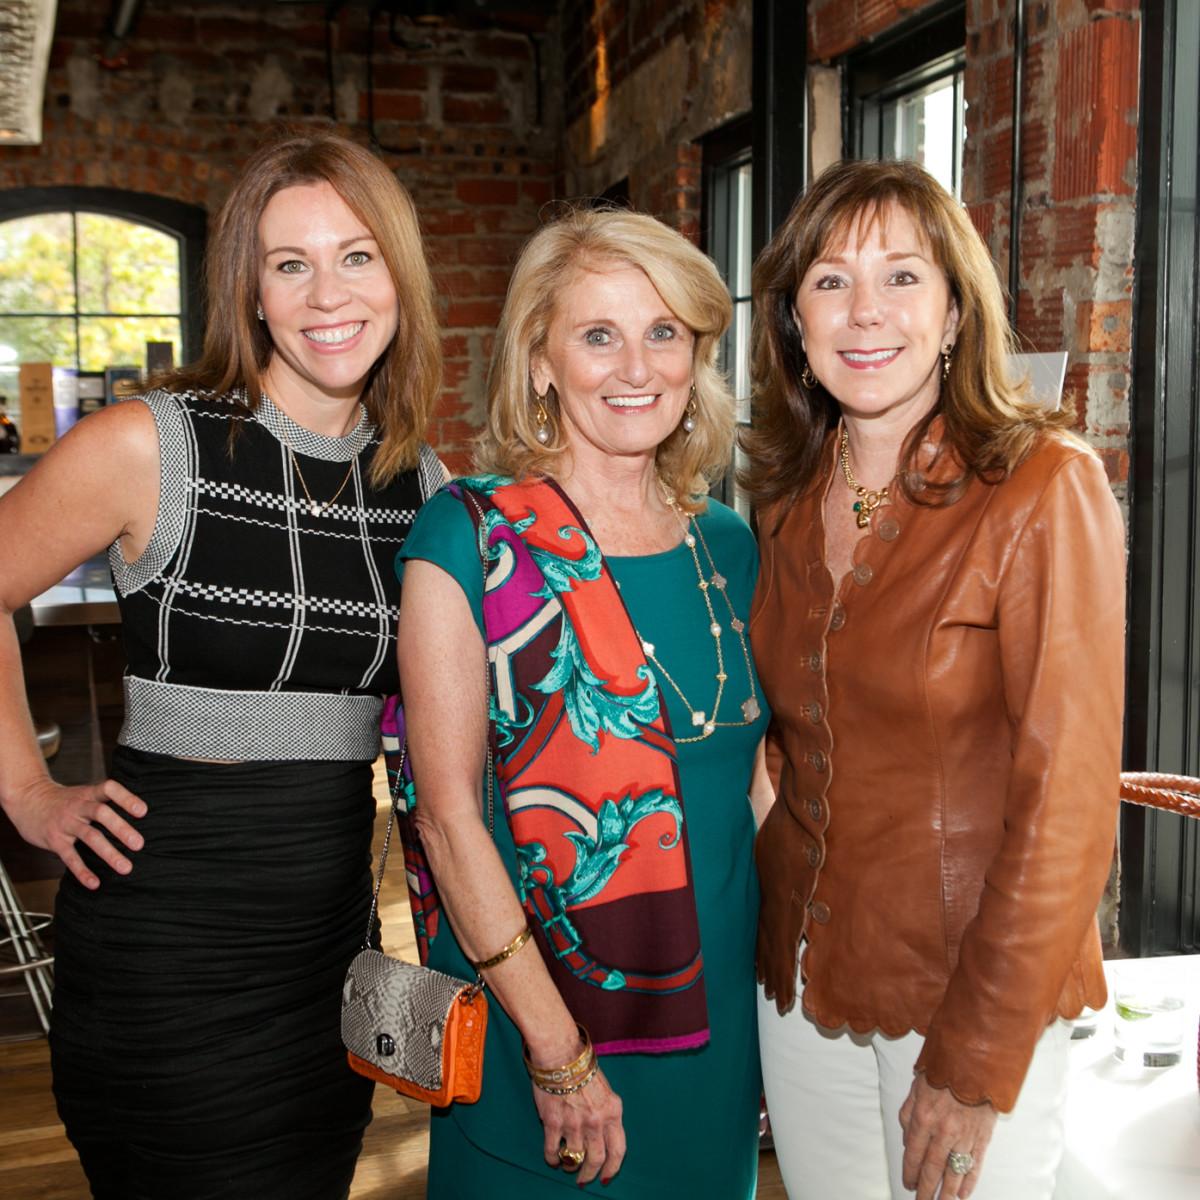 News, Shelby, Catwalk for a Cure kickoff, Oct. 2015, Allison Flikerski, Denise Monteleone, Elizabeth Stein